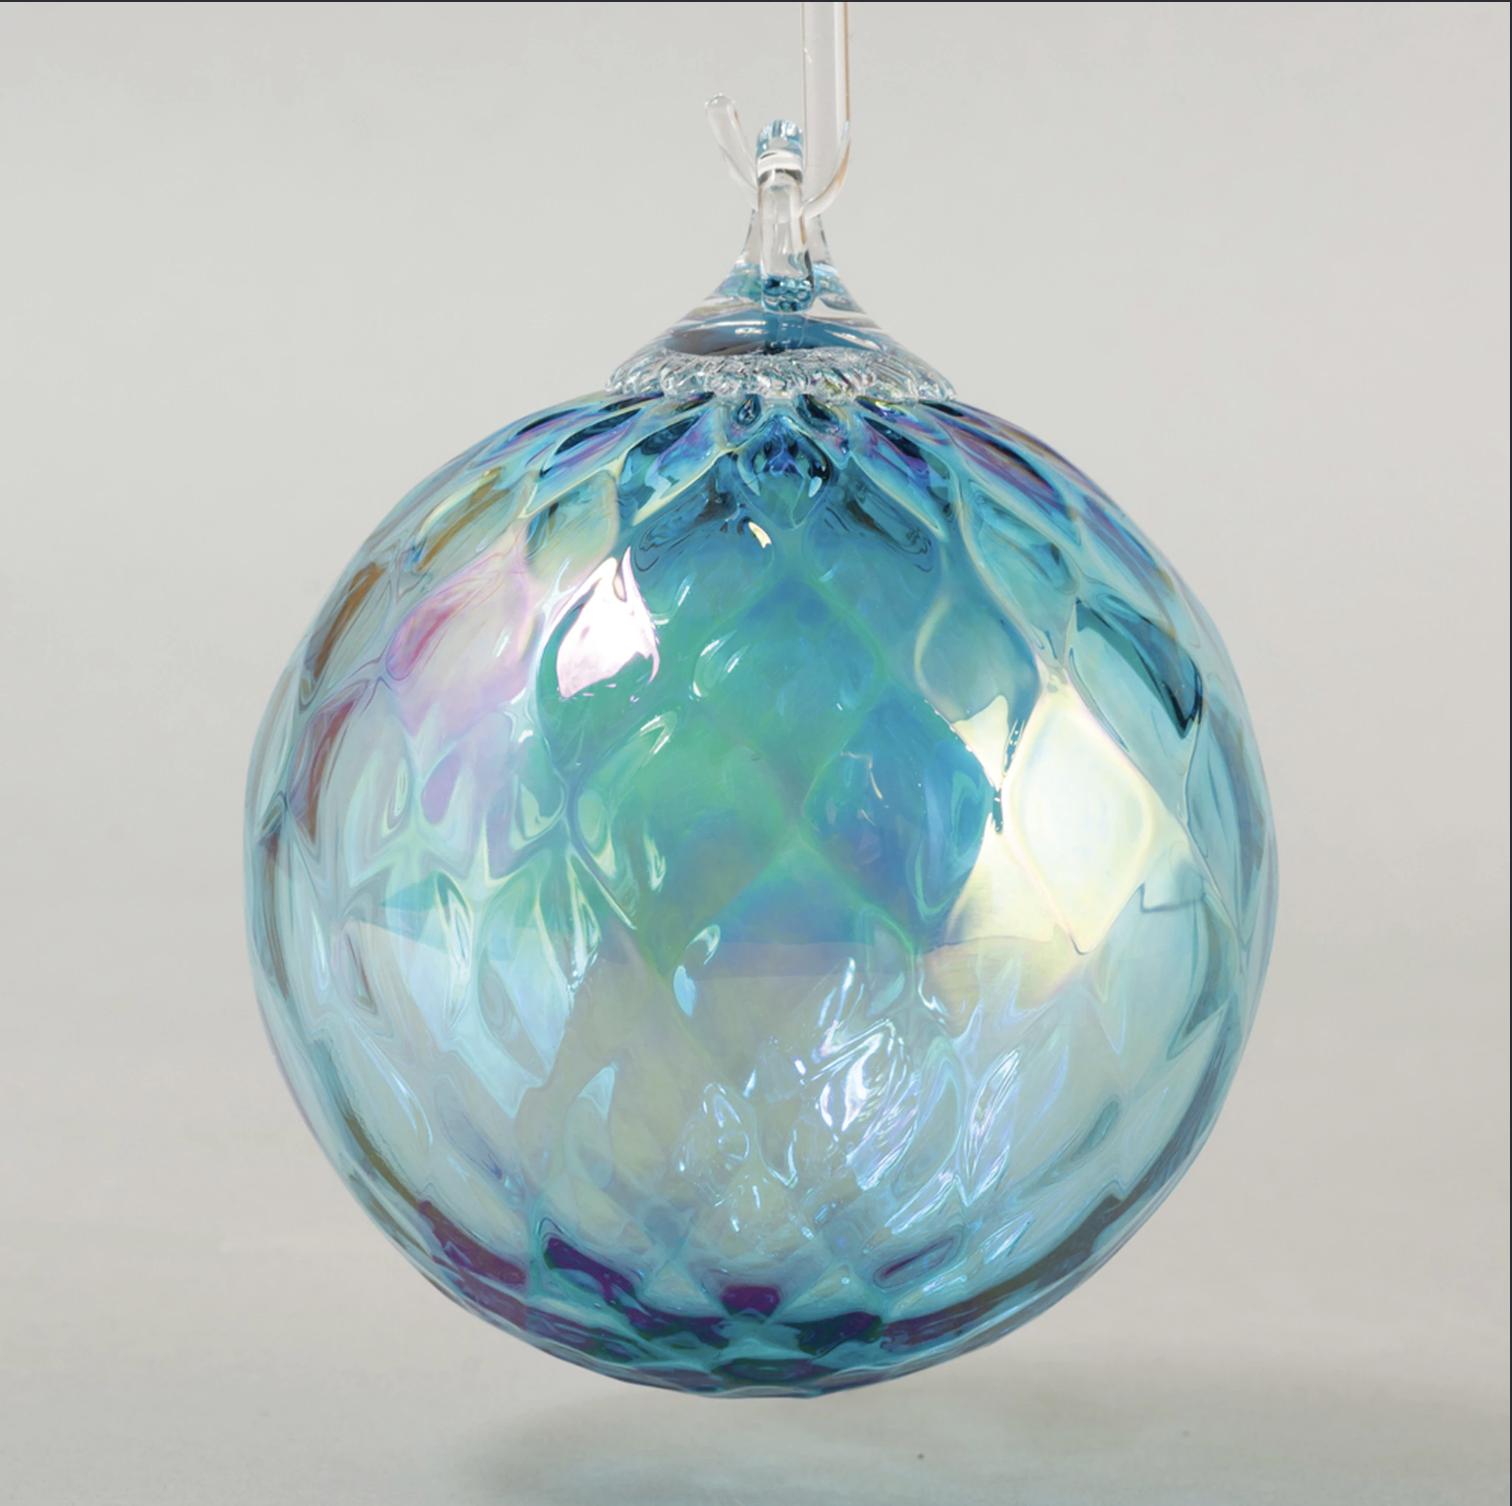 GLASS EYE BIRTHSTONE ORNAMENT DECEMBER